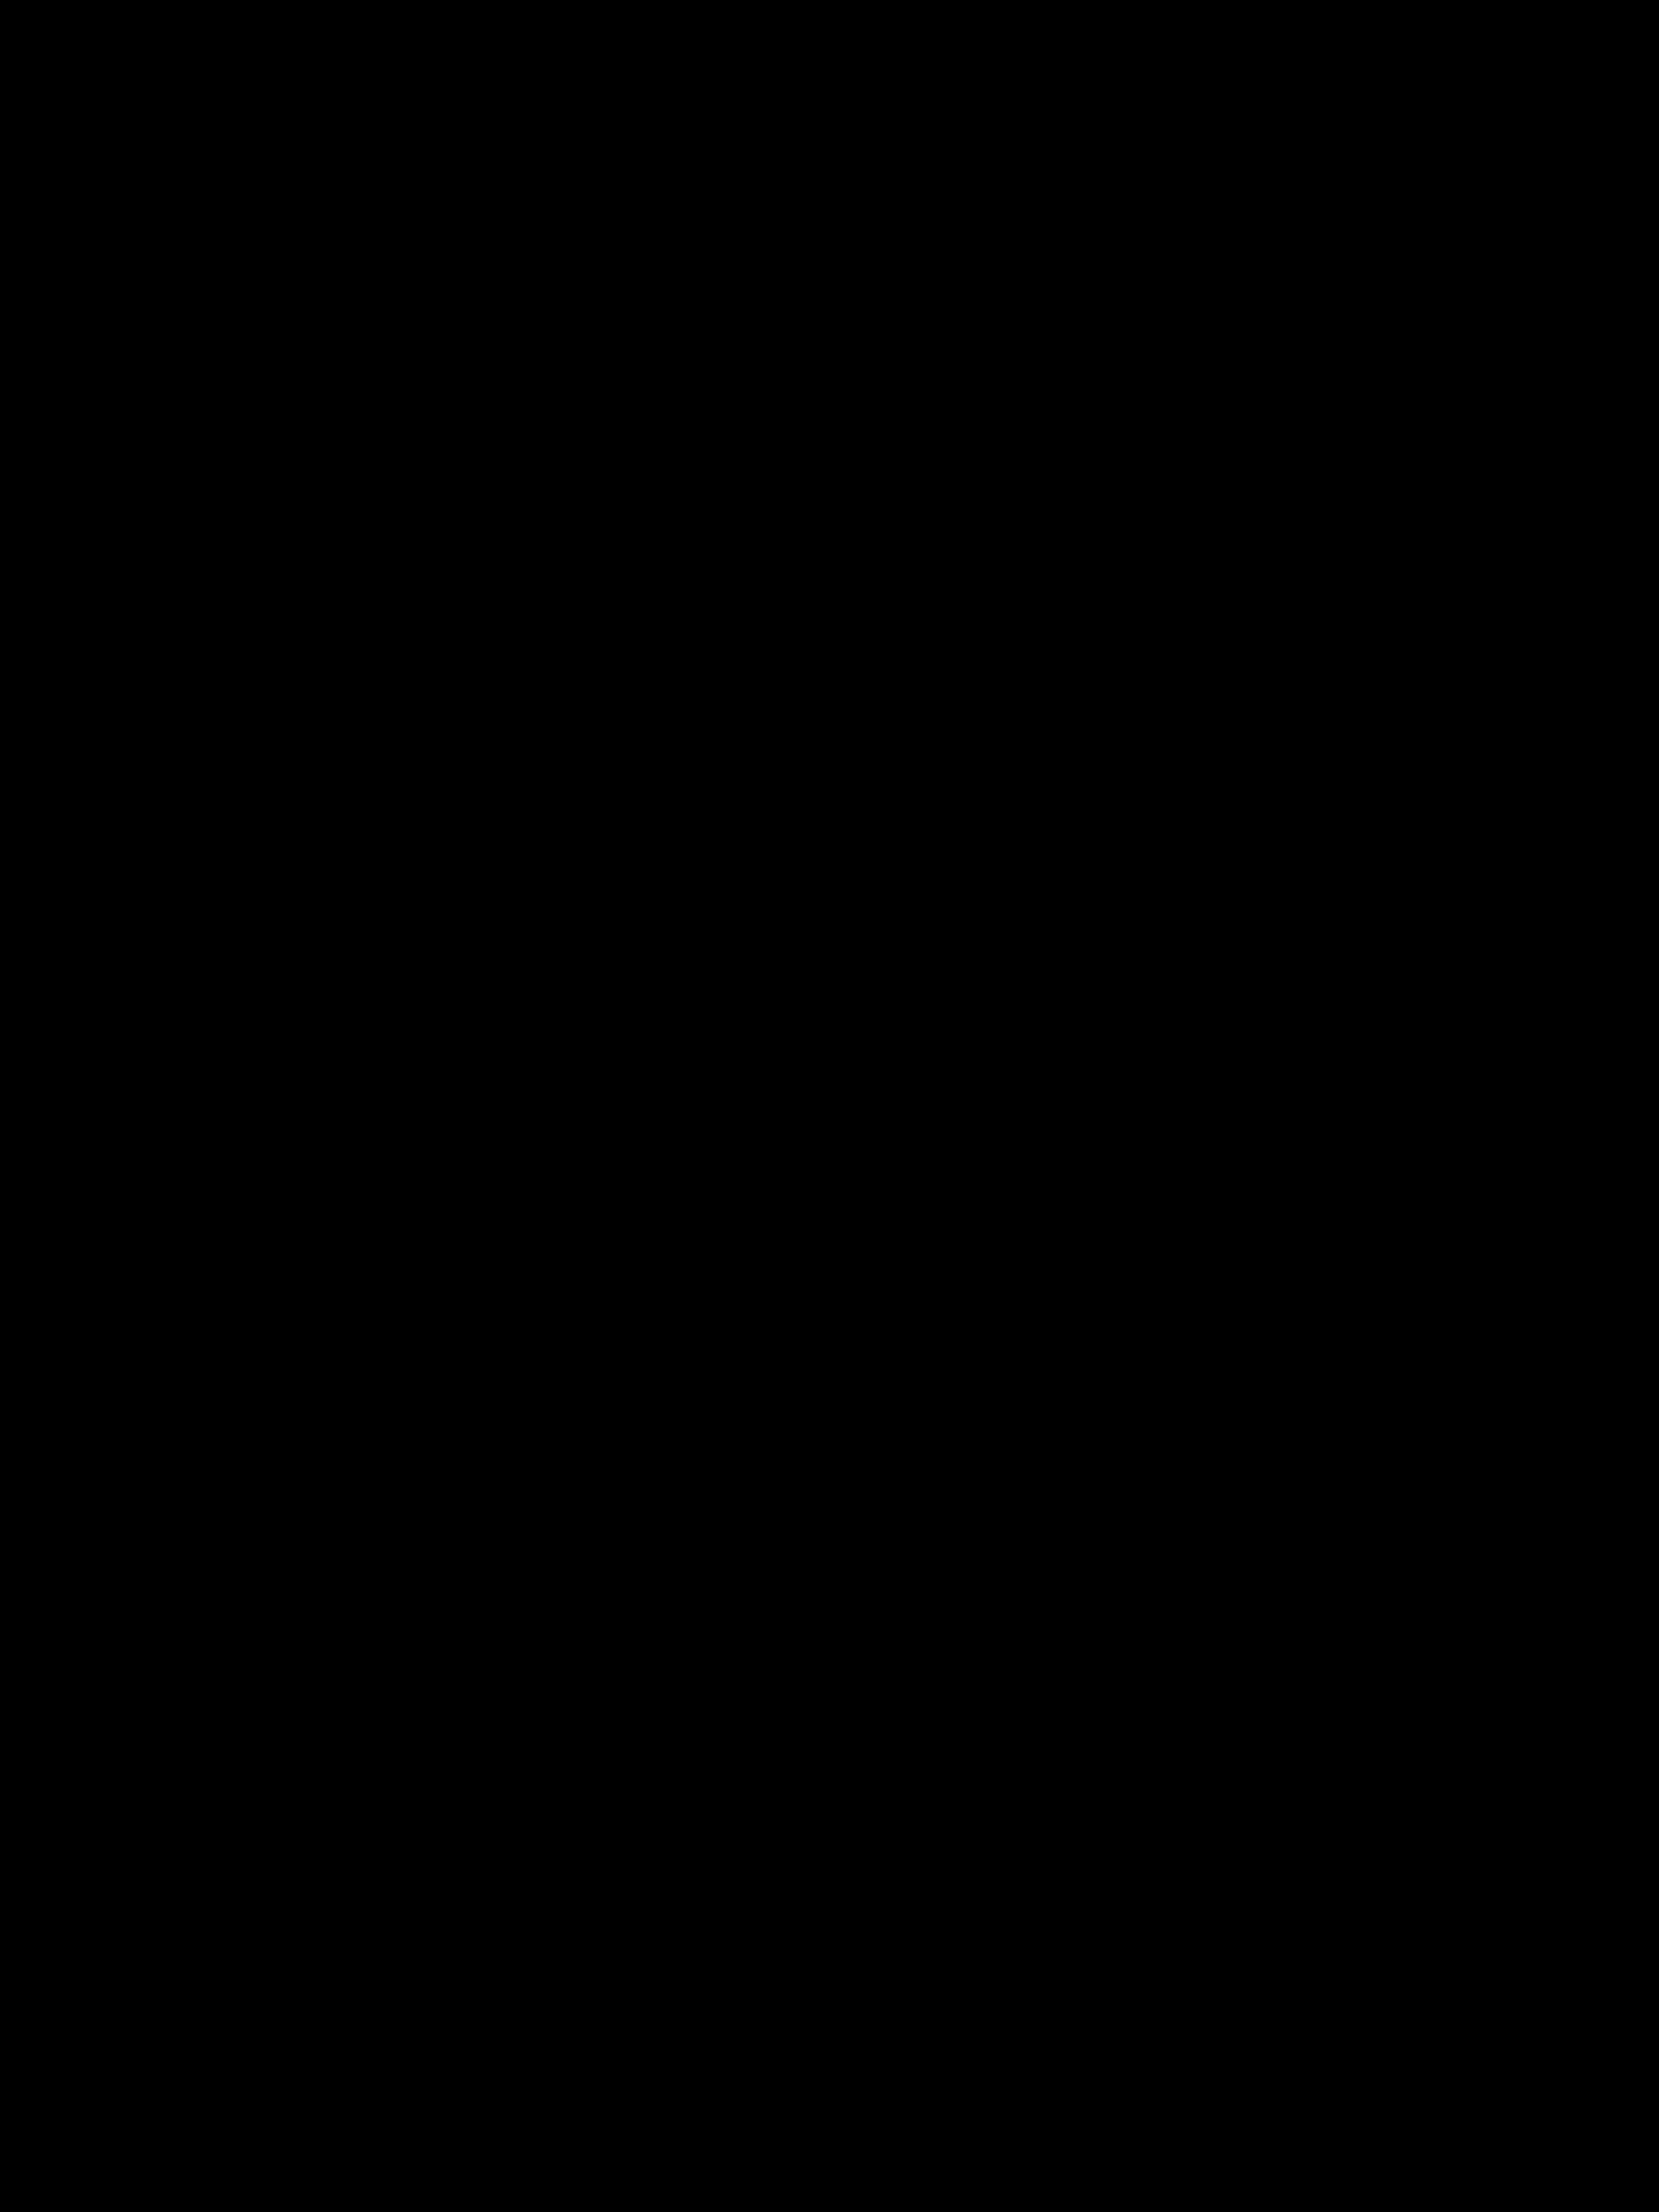 BVL kuilsnijder